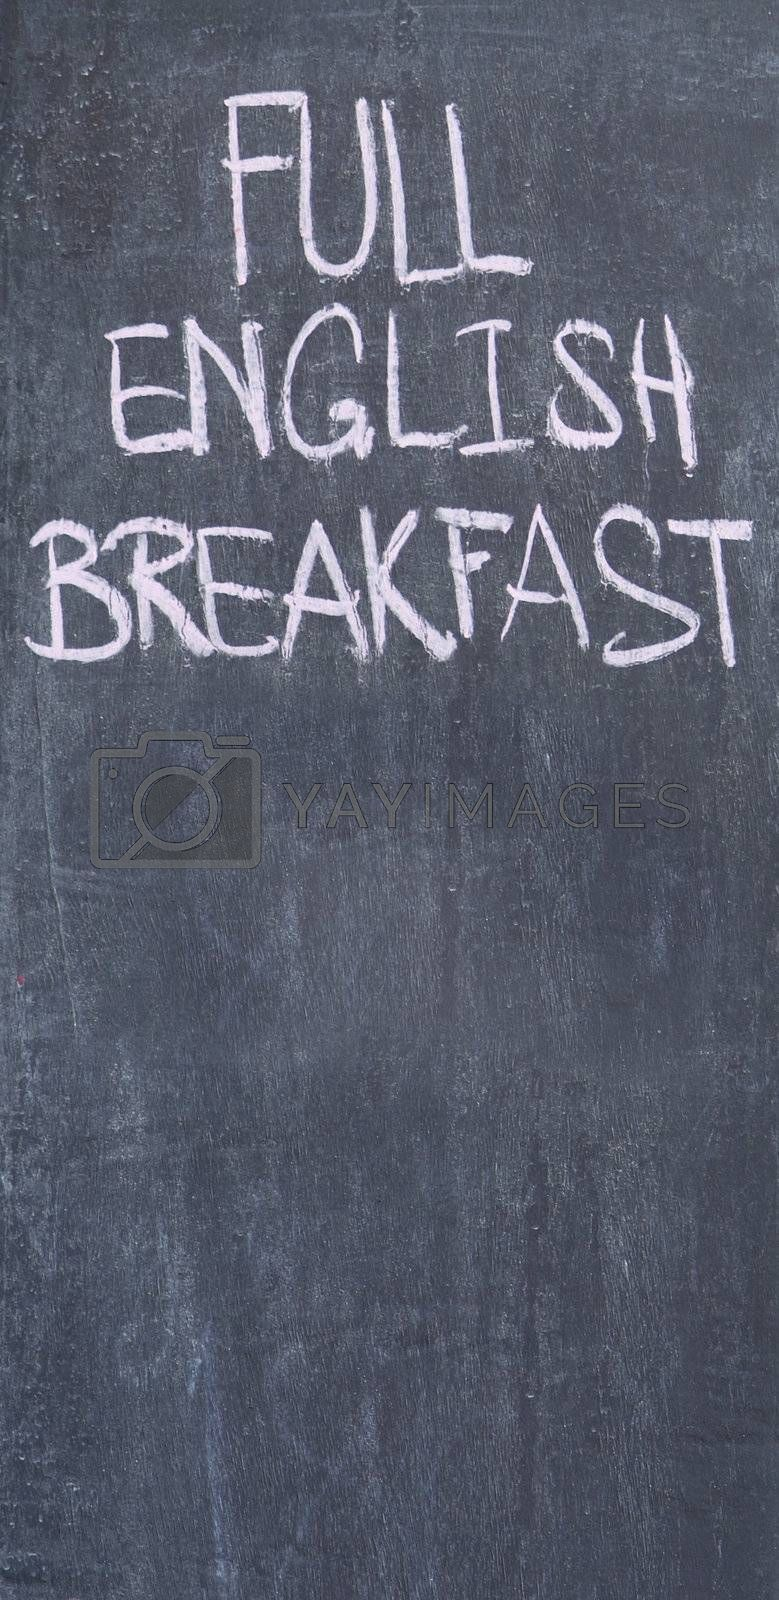 Full English breakfast by epixx